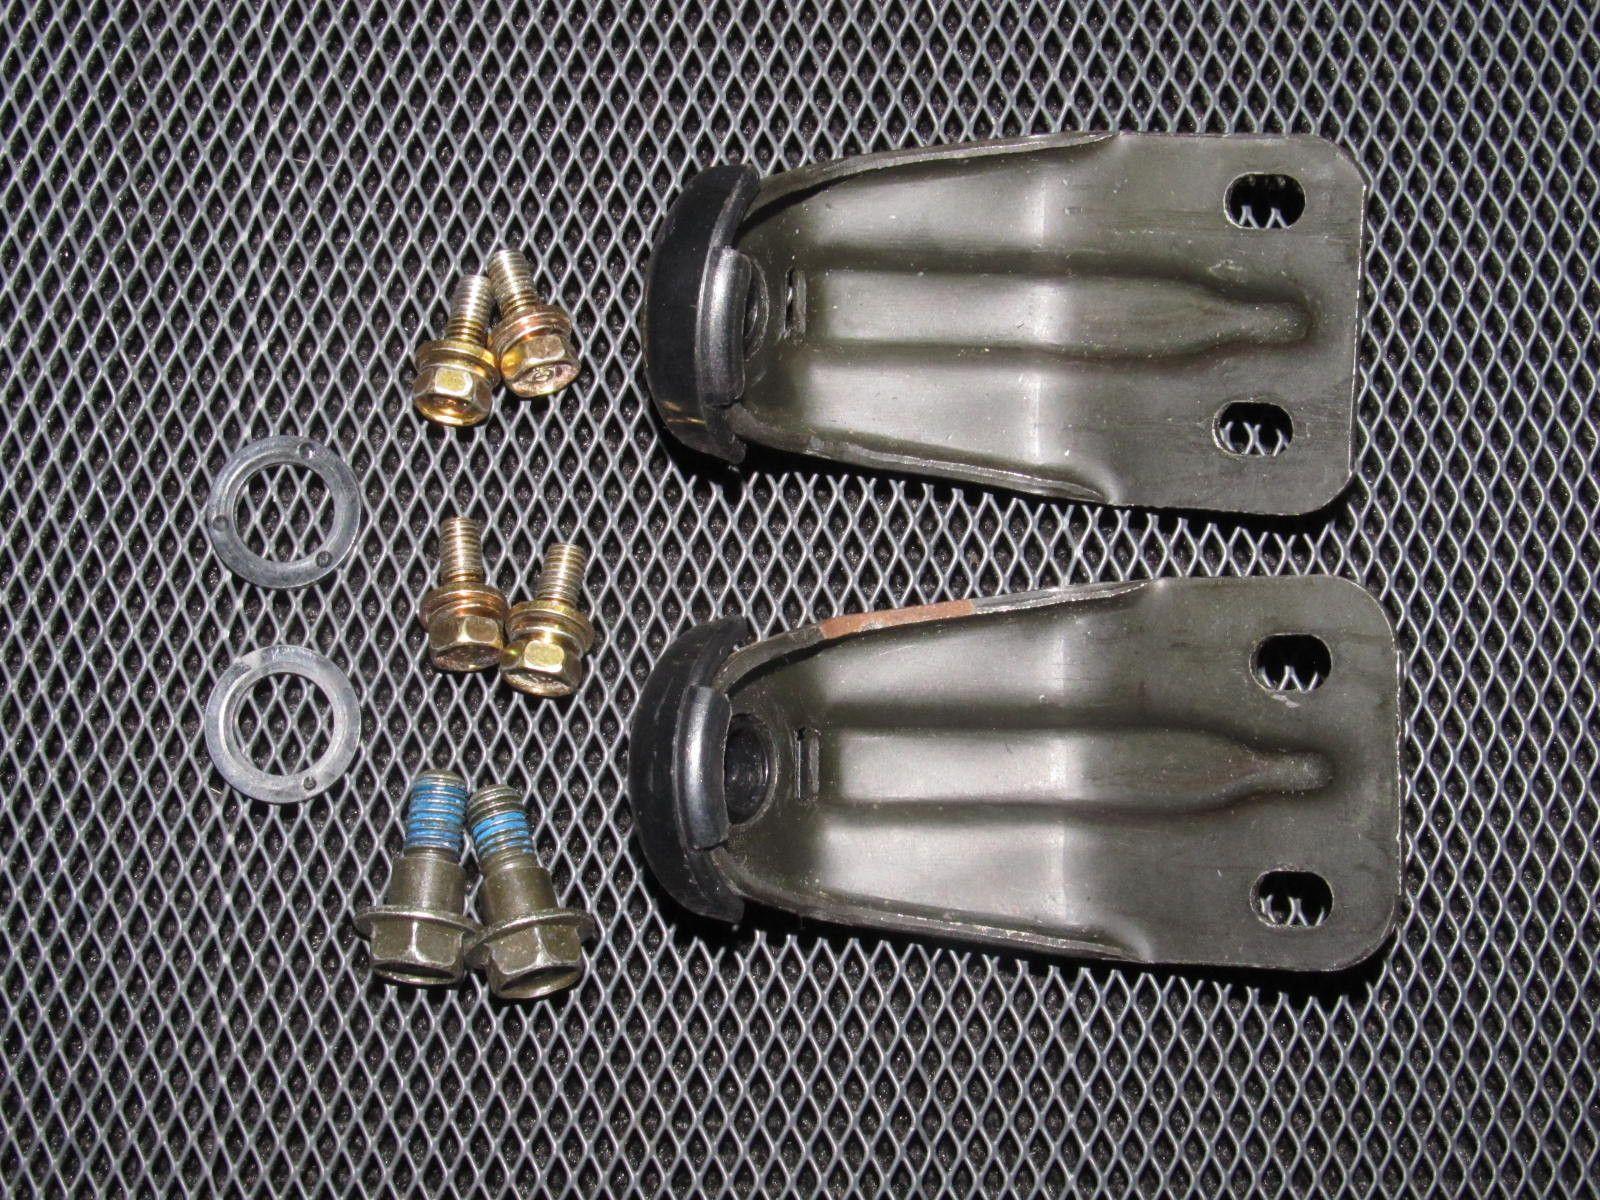 92-95 Honda Civic OEM Radiator Mounting Bracket - 2 pieces